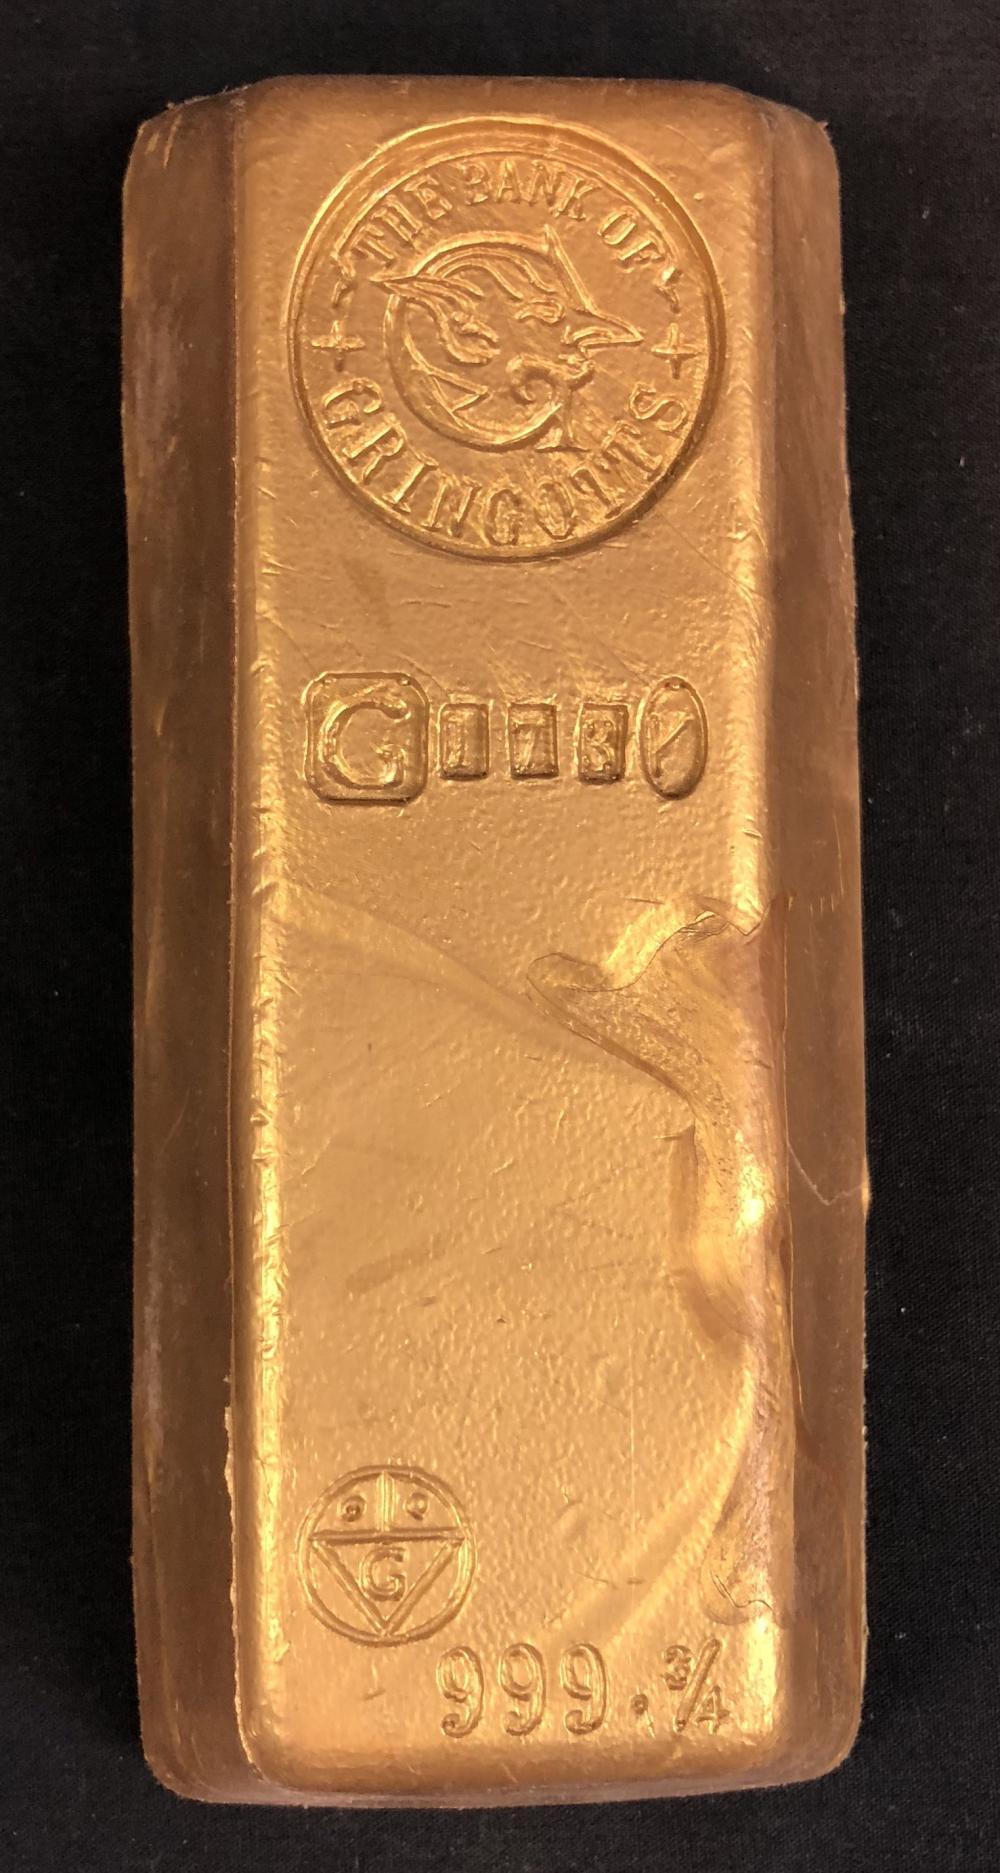 Harry Potter and the Half-Blood Prince (2009) - Gringotts Bank Gold Bar (Large)